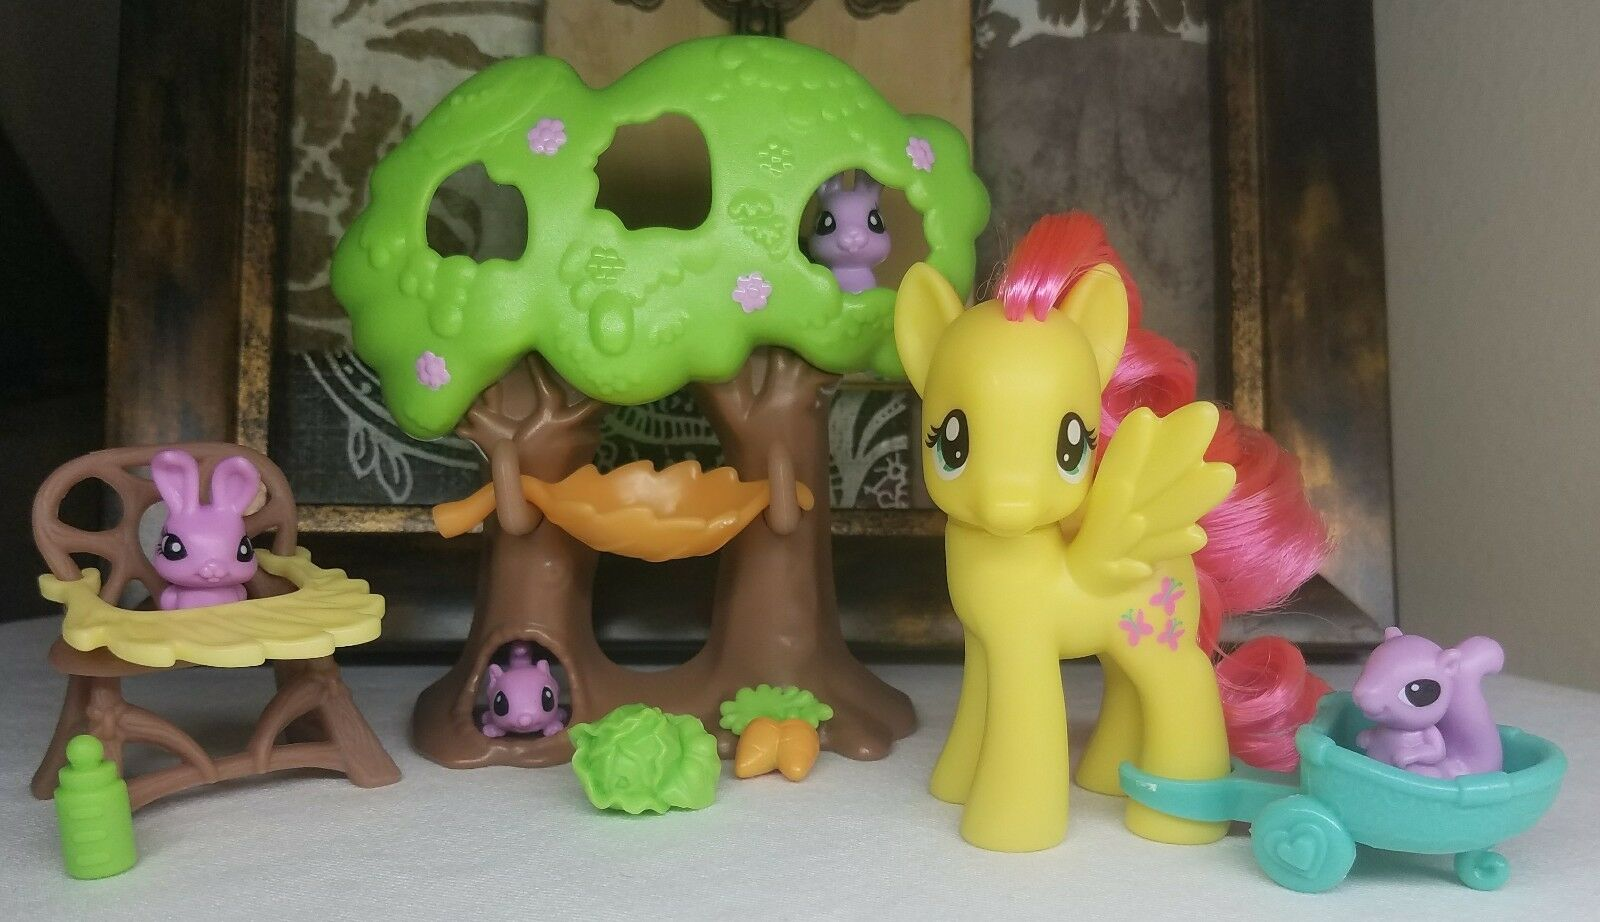 My Little Pony FiM G4 Fluttershy's Fluttershy's Fluttershy's Nursery Tree Accessories Playset Lot Pets ae2708